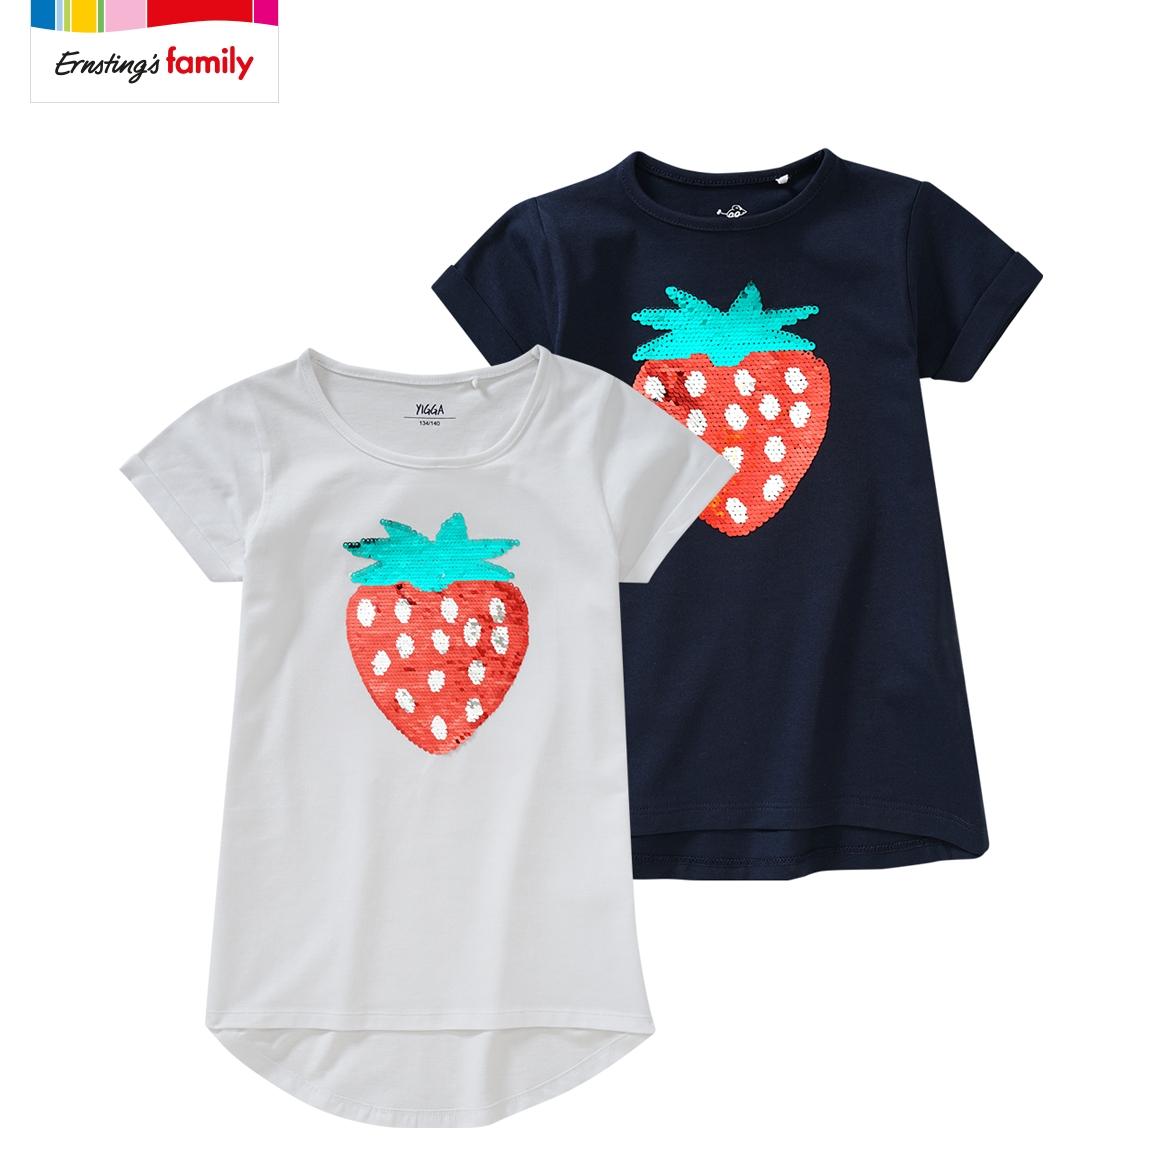 Kinder Mädchen T-Shirts